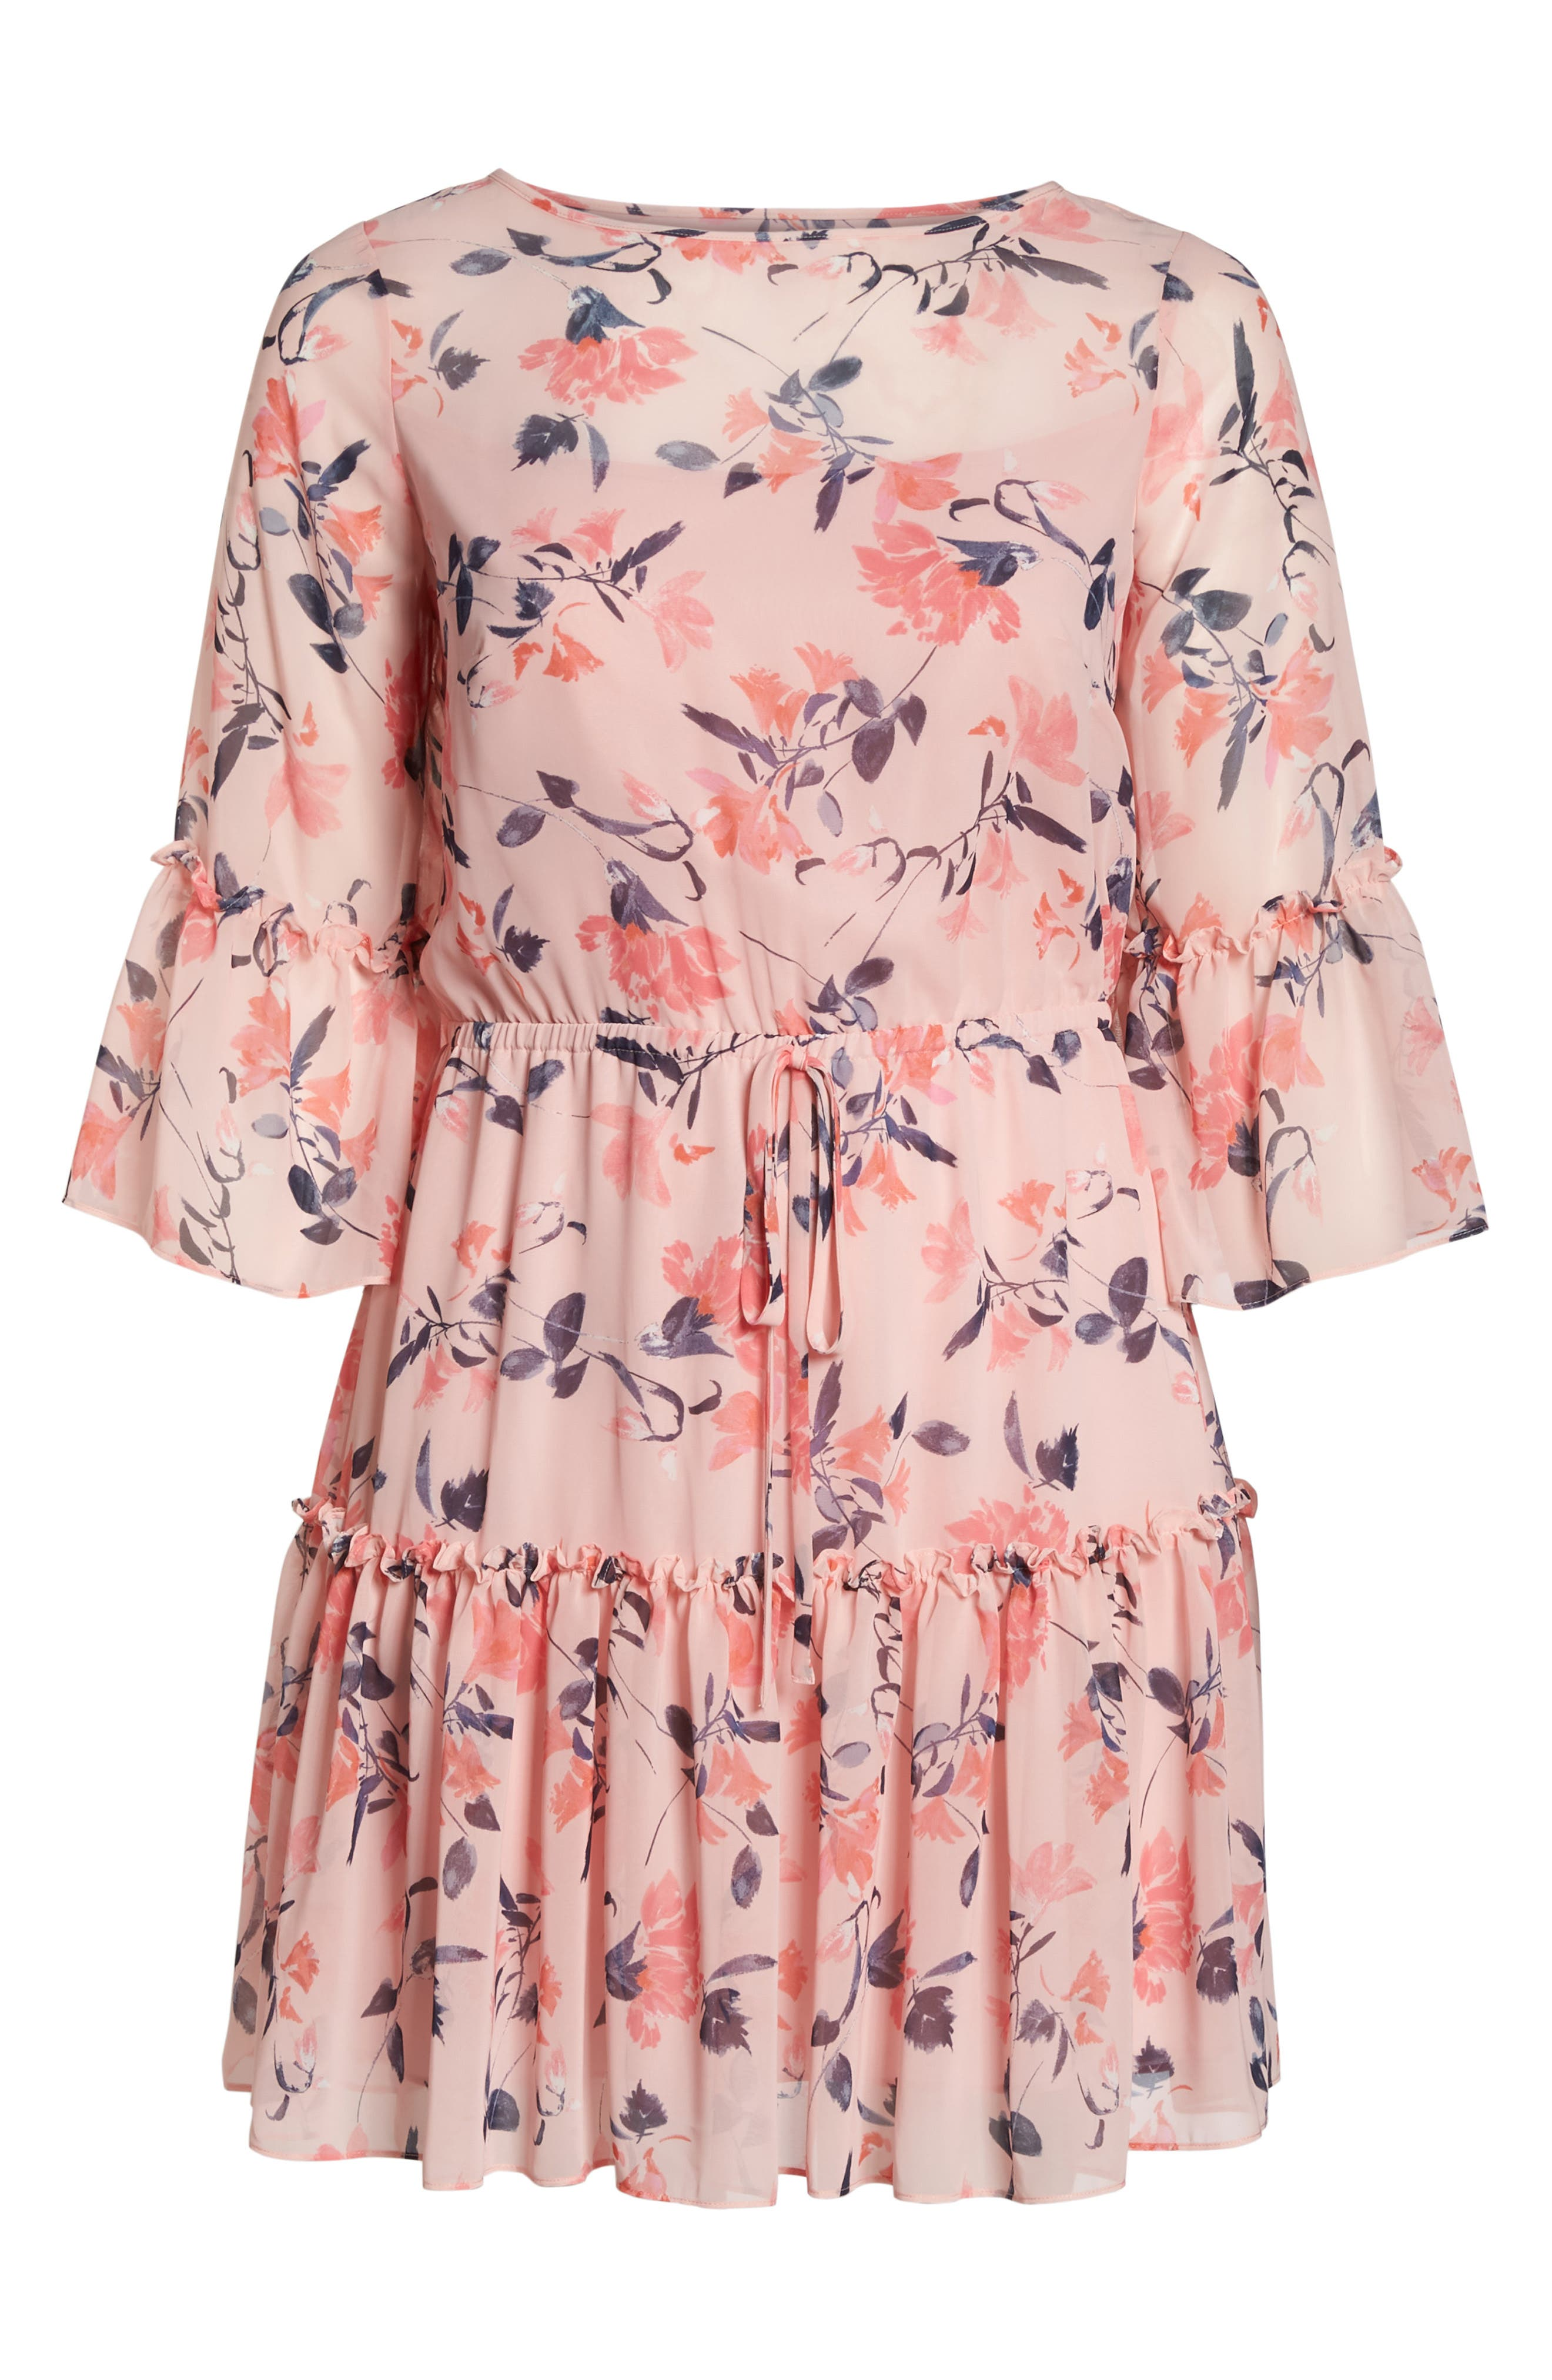 Elza J Floral Bell Sleeve Chiffon Dress,                             Alternate thumbnail 7, color,                             Blush